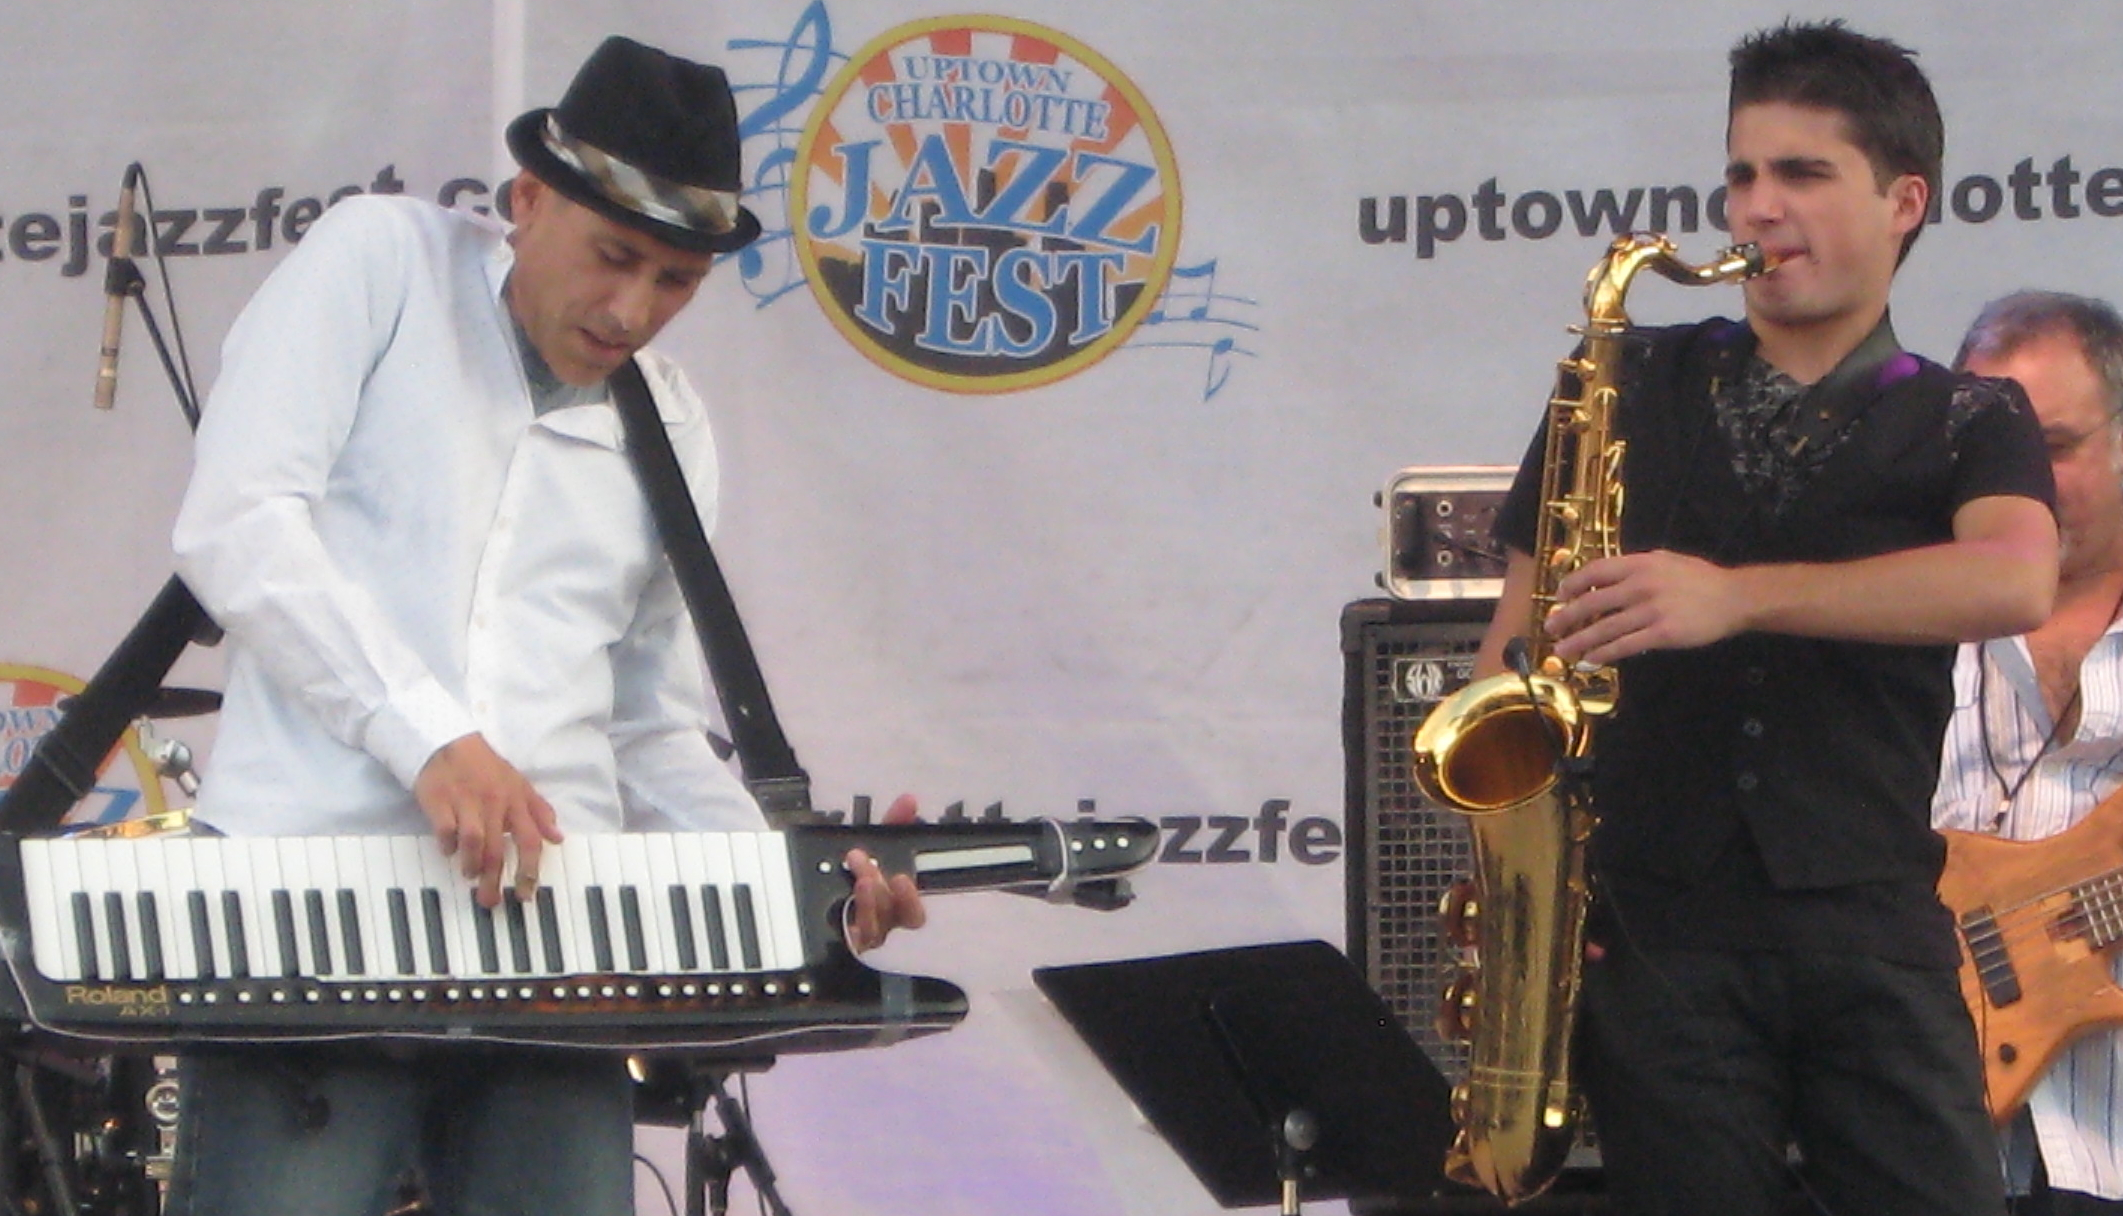 Gregg karukas,vincent ingala,uptown jazz fest